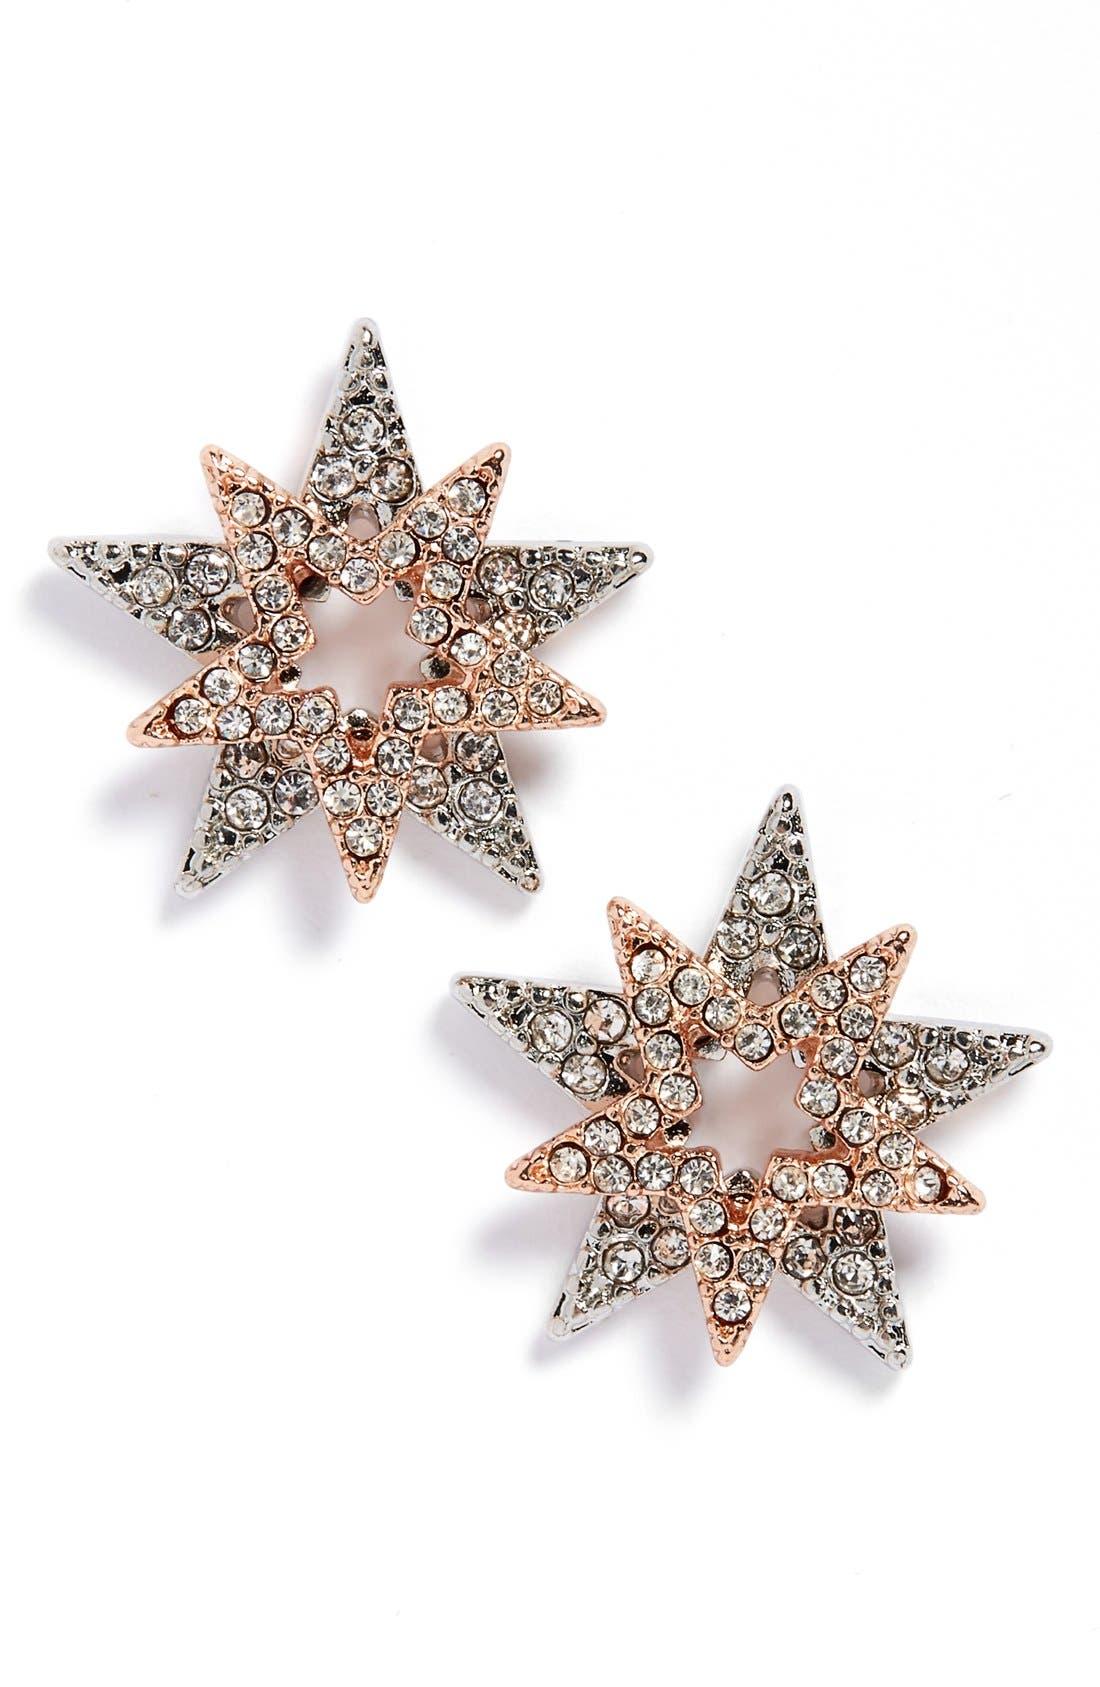 Main Image - Sole Society 'Celestial' Stud Earrings